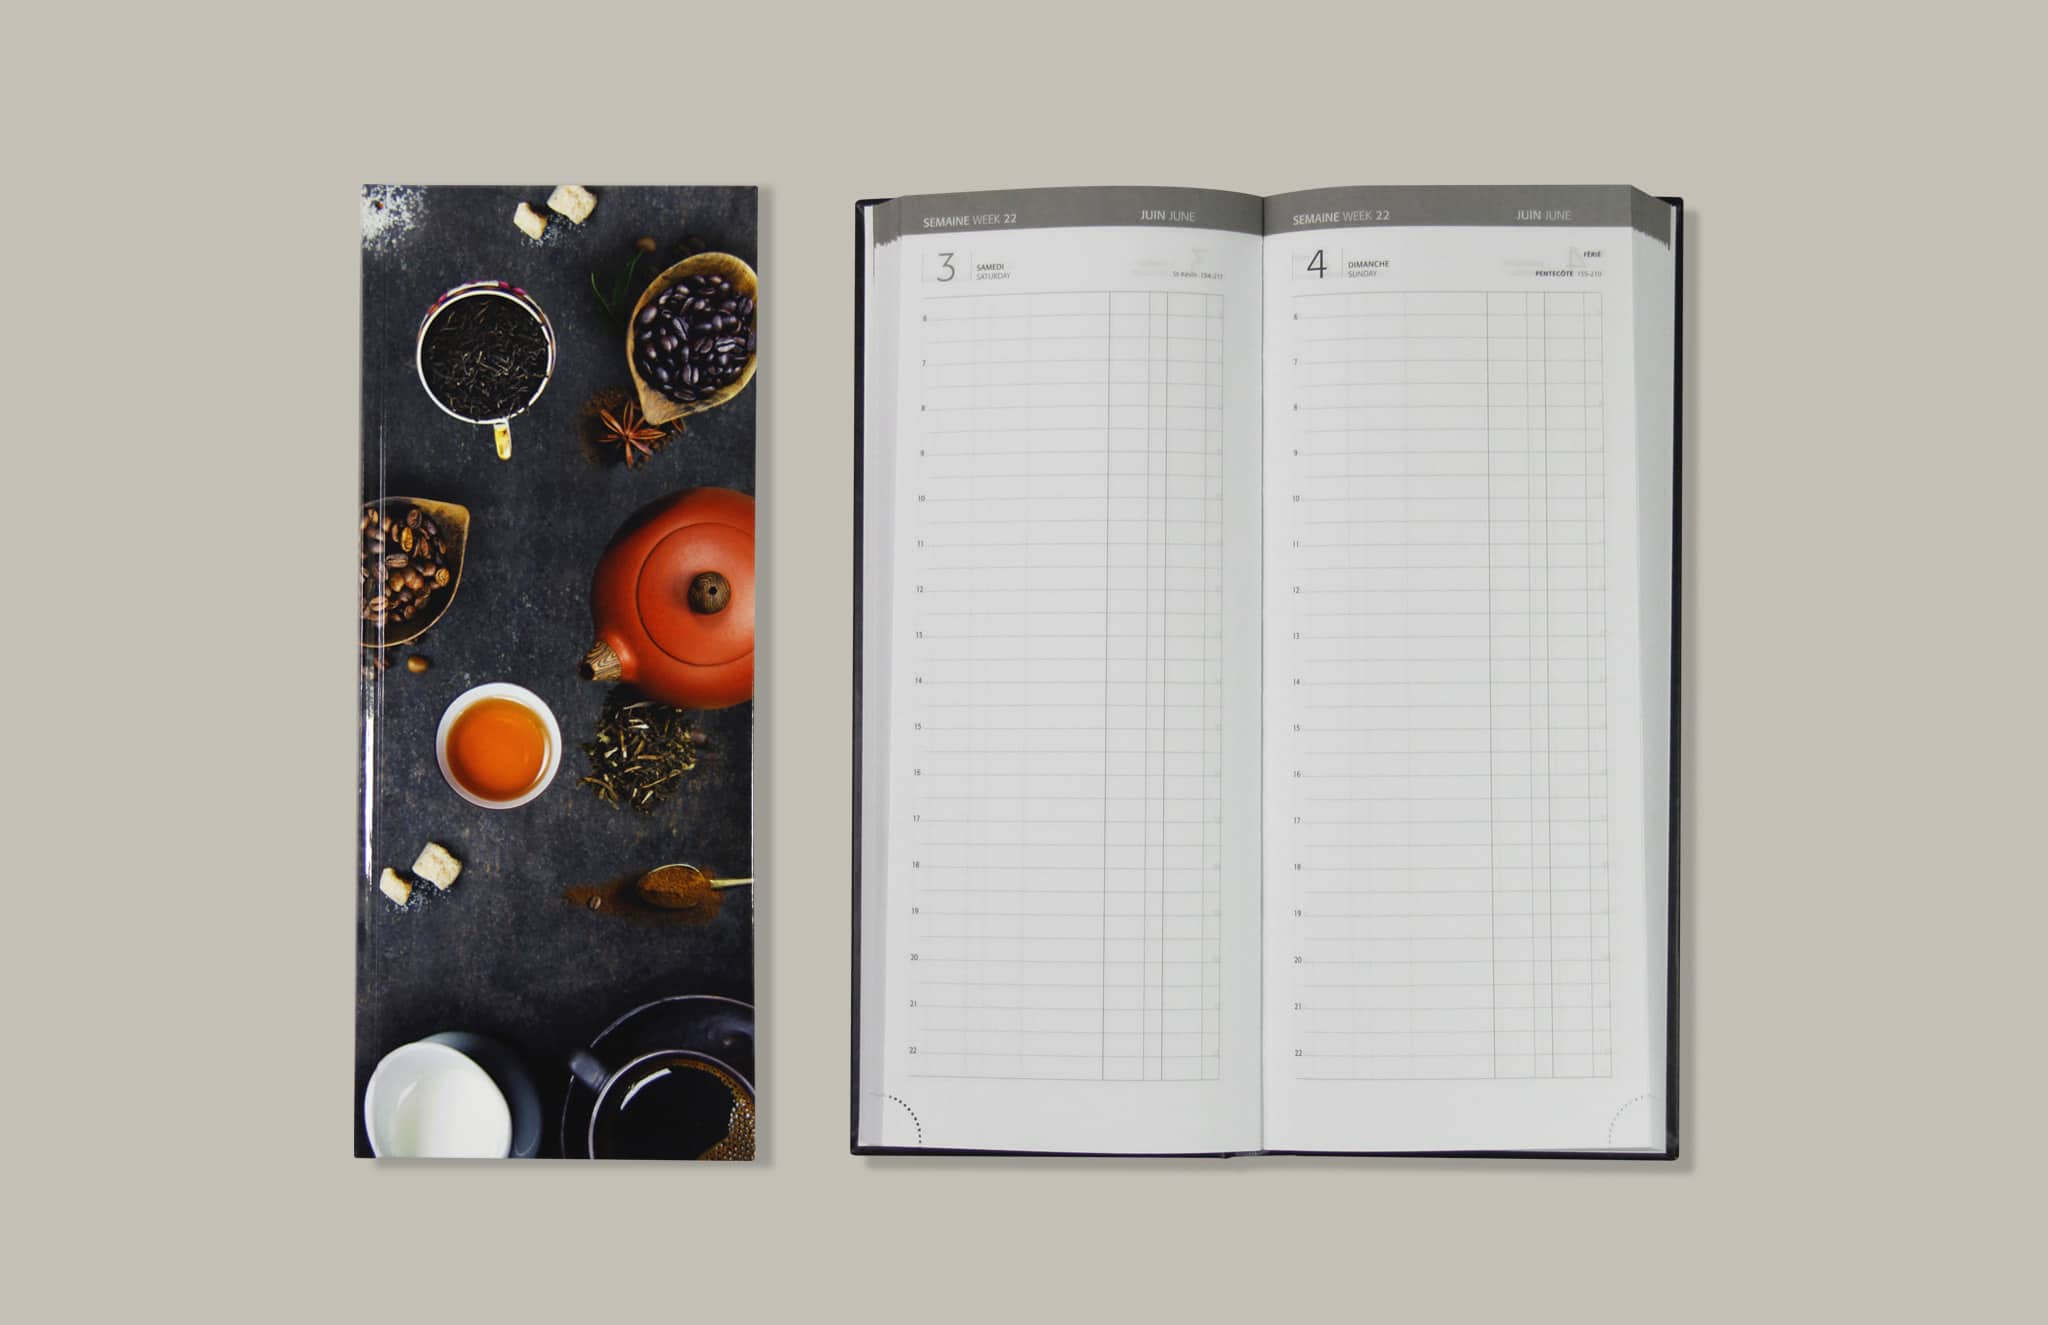 Agenda Long V34 Couverture Imprimee Reliure Emboitee